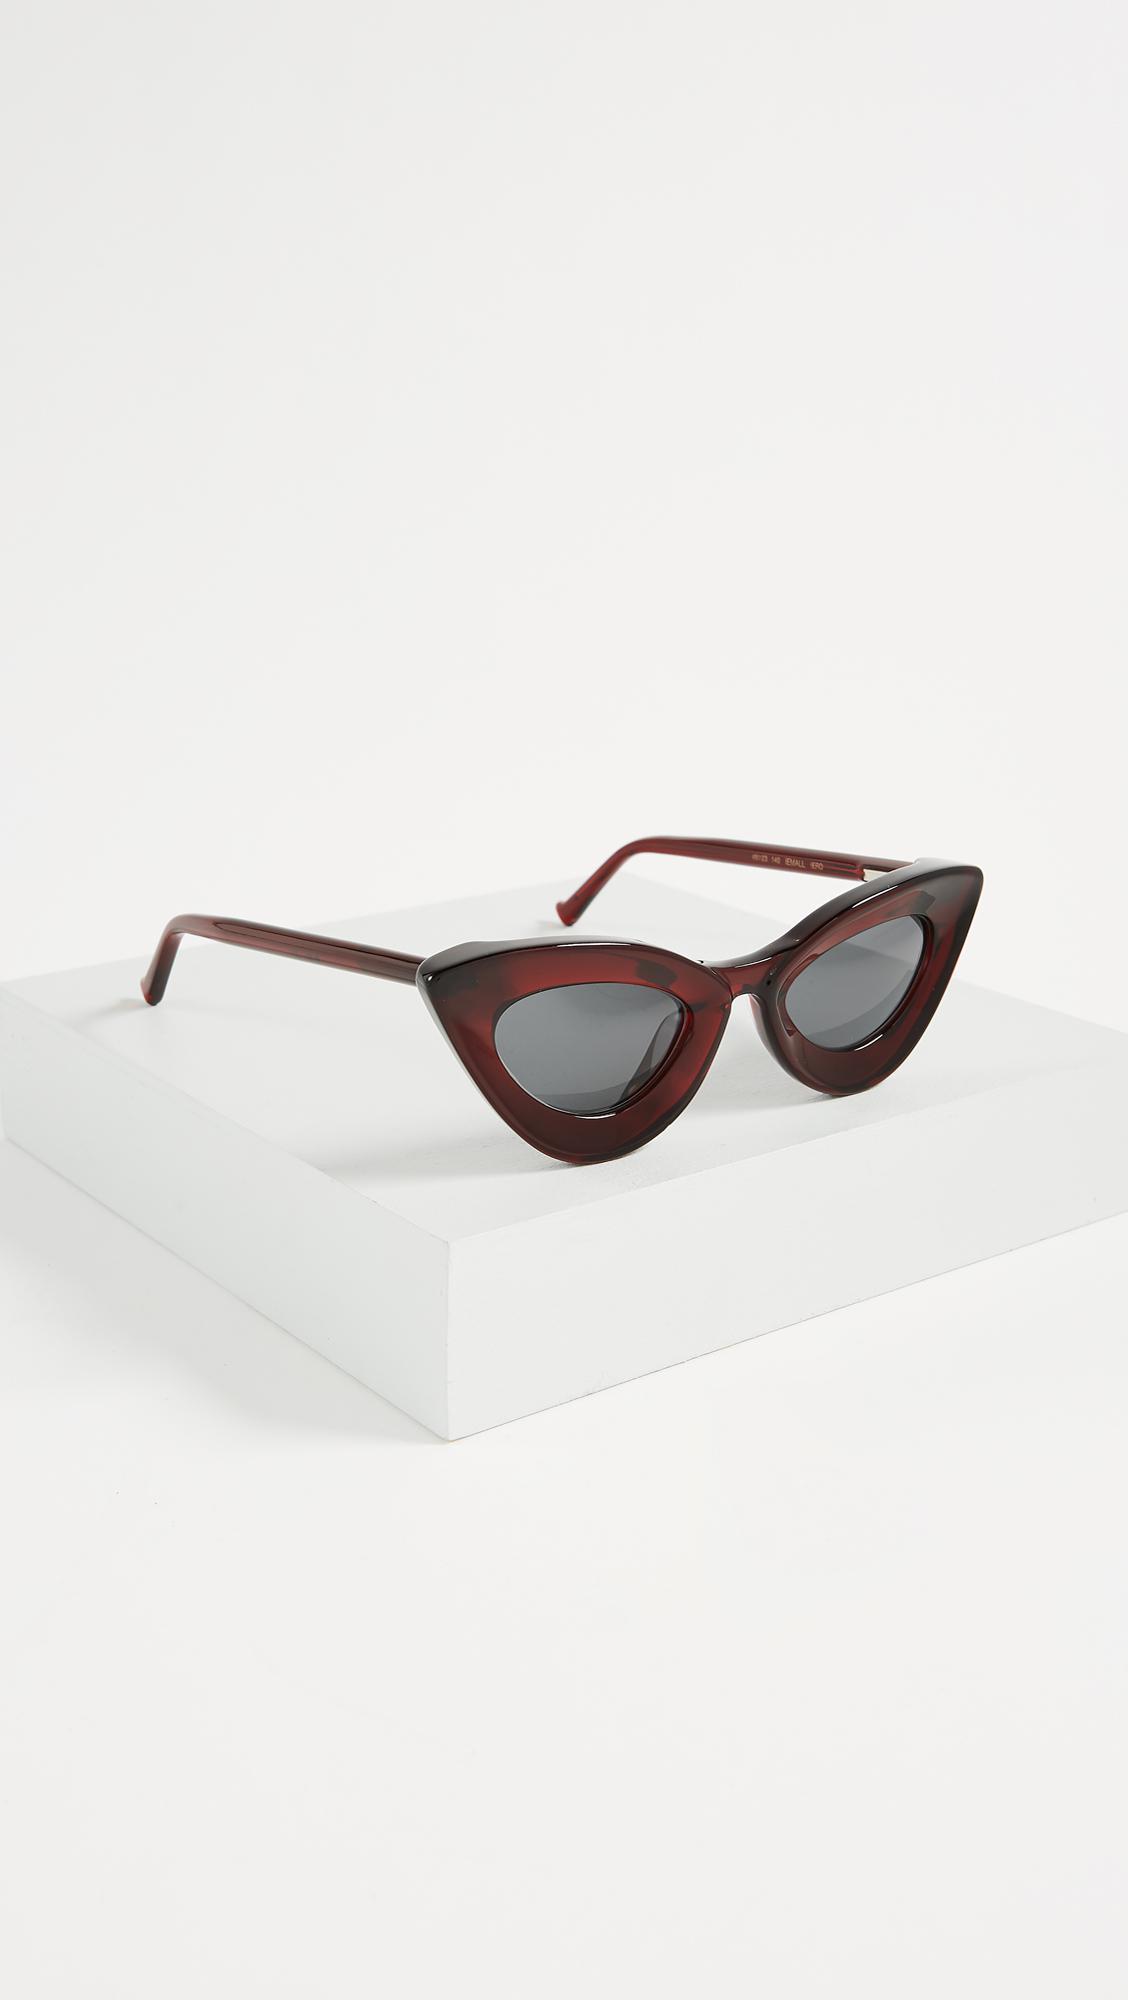 33e09a9ec7 Grey Ant Iemall Cat Eye Sunglasses - Lyst